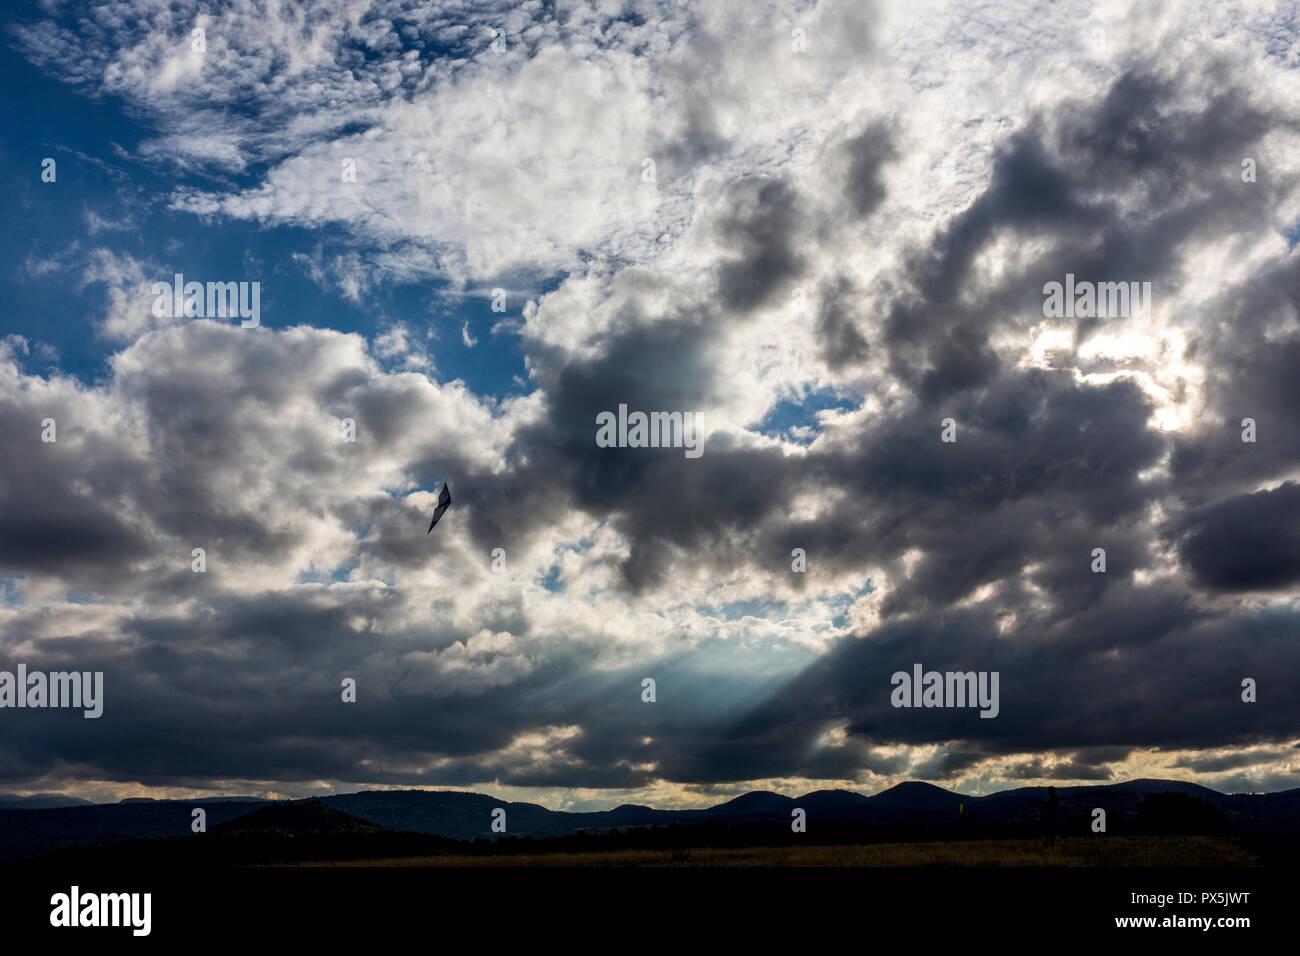 Kite flying on a cloudy evening at Plateau de Gergovie, Auvergne, France. Stock Photo